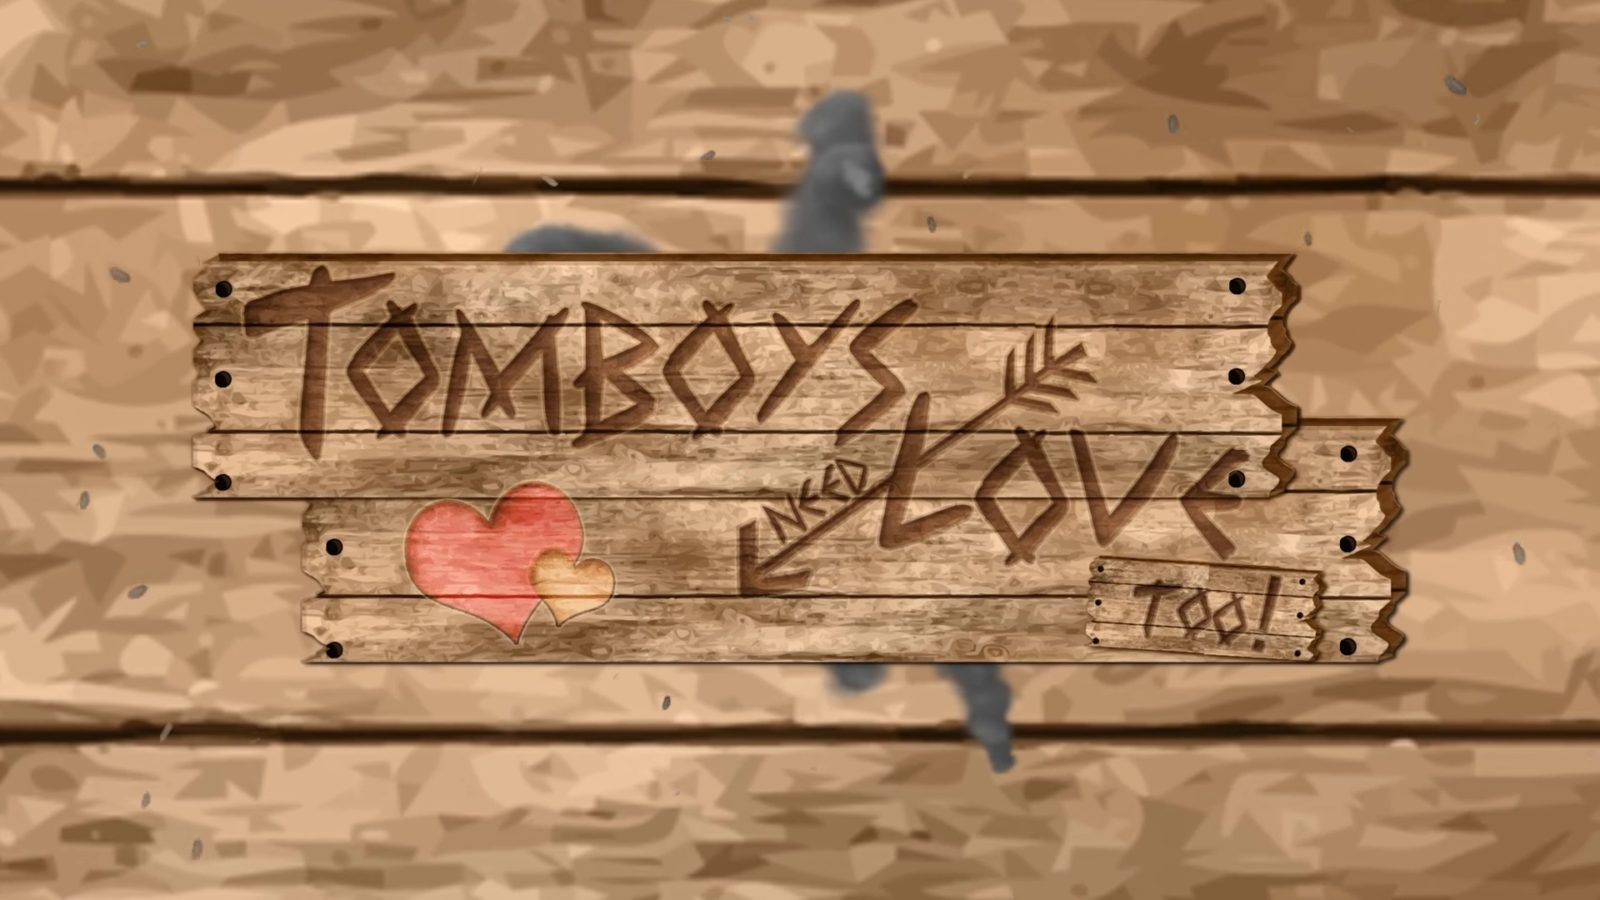 Tomboys Need Love Too!!